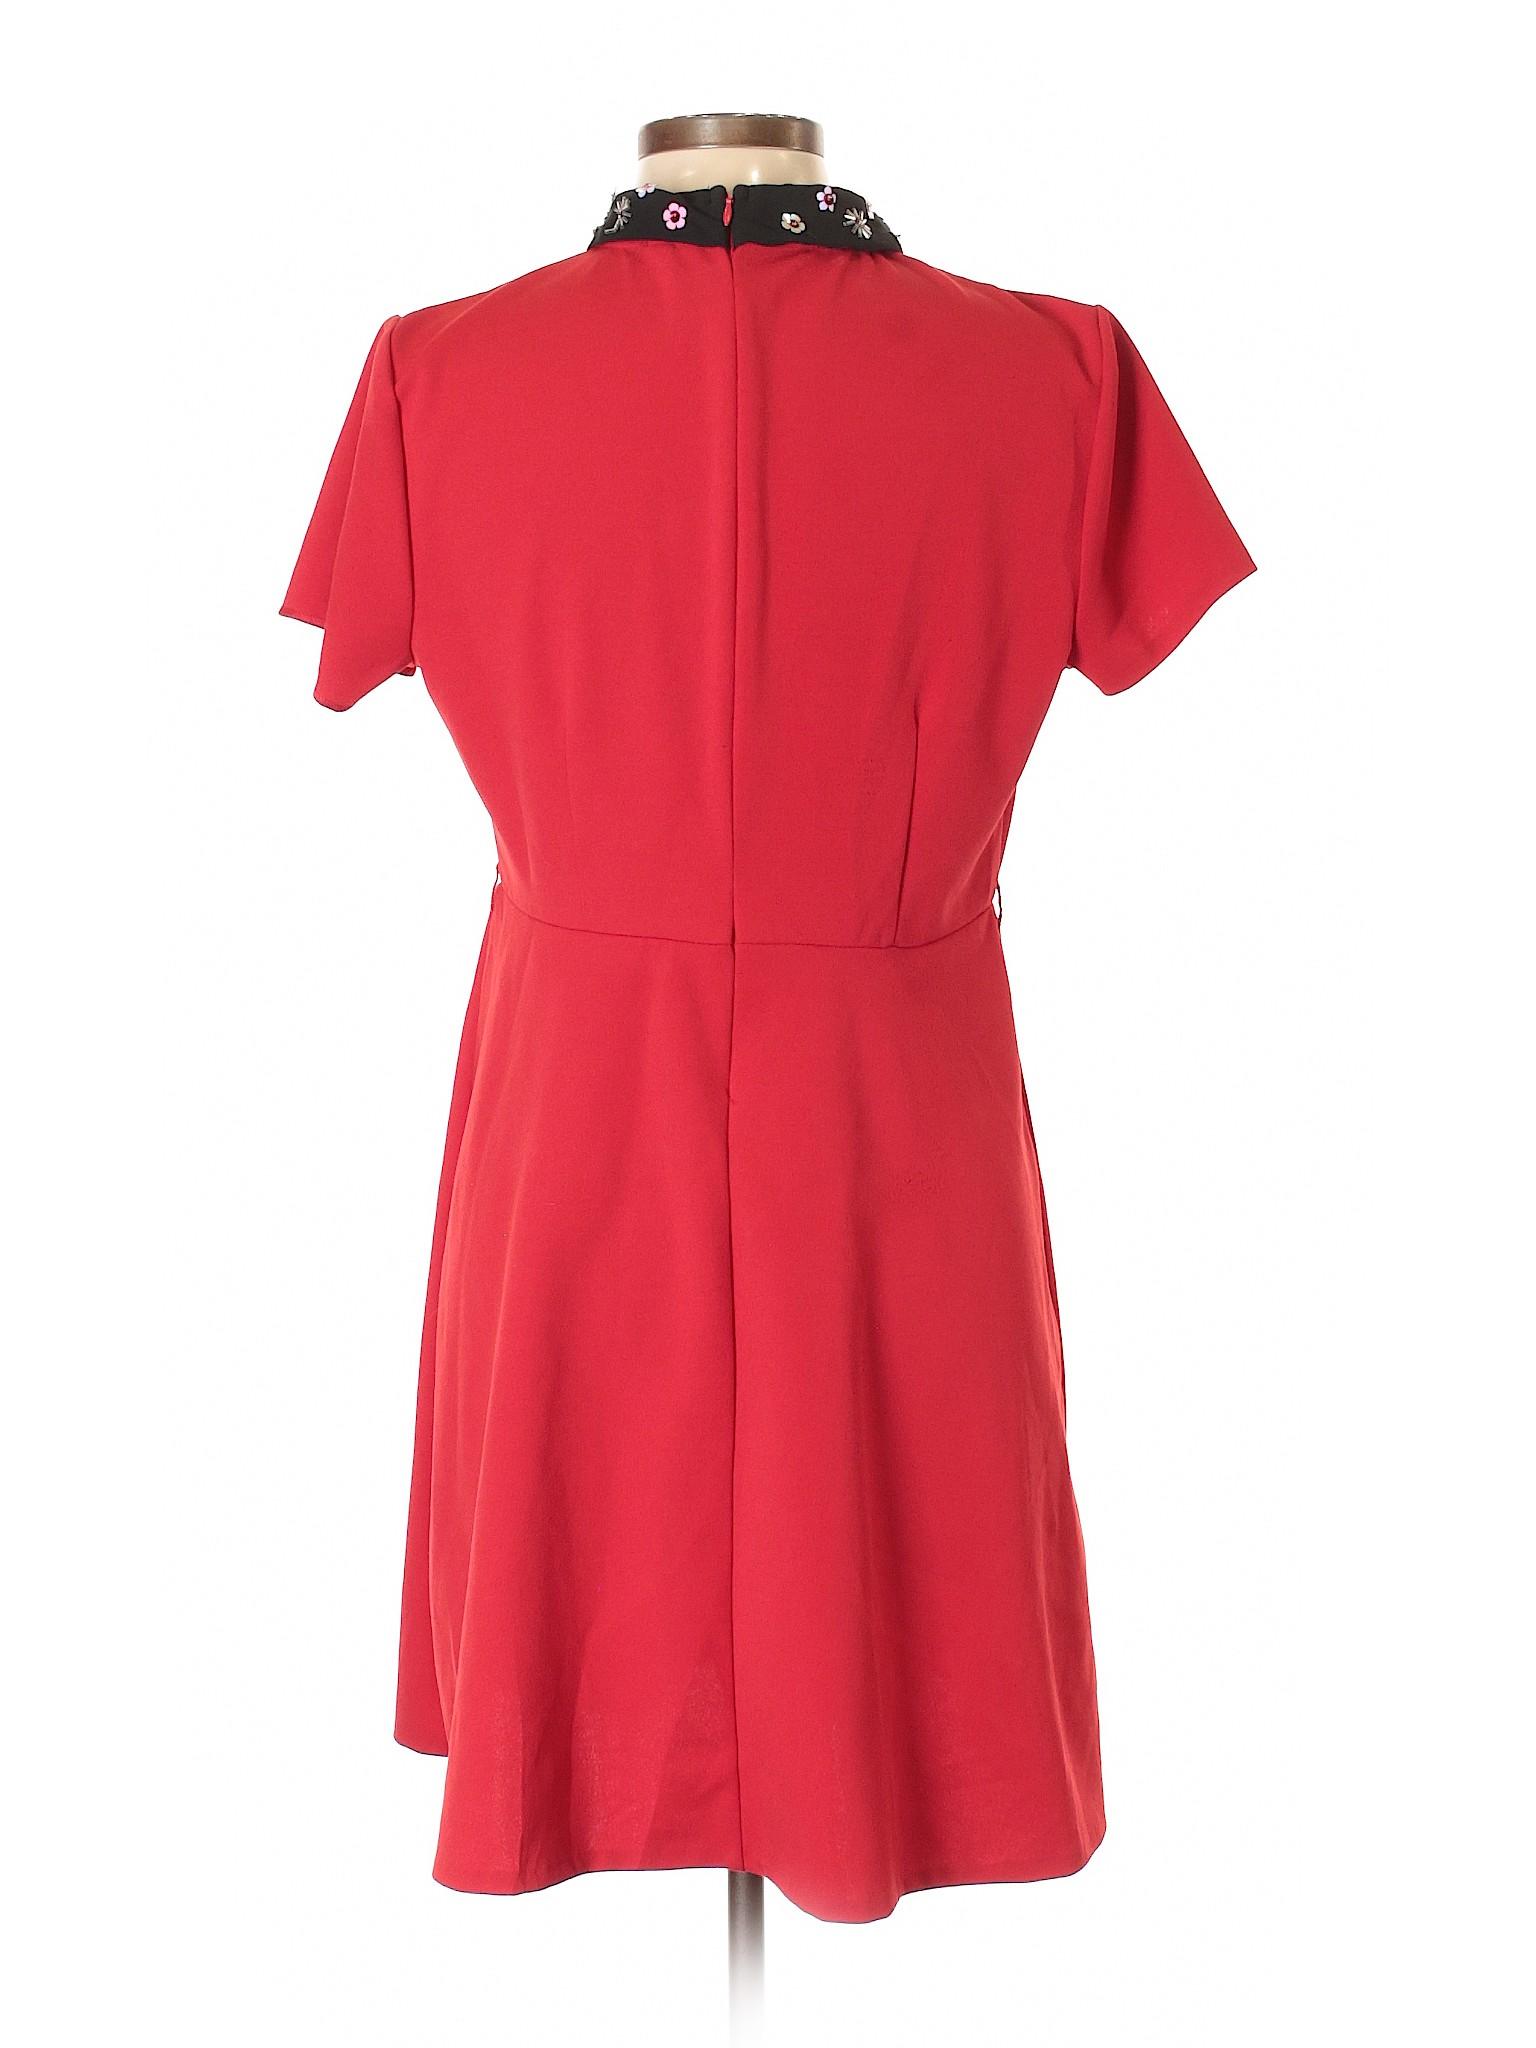 Elle Dress Elle Elle Dress Dress Selling Selling Casual Casual Elle Selling Selling Casual 7qvRO